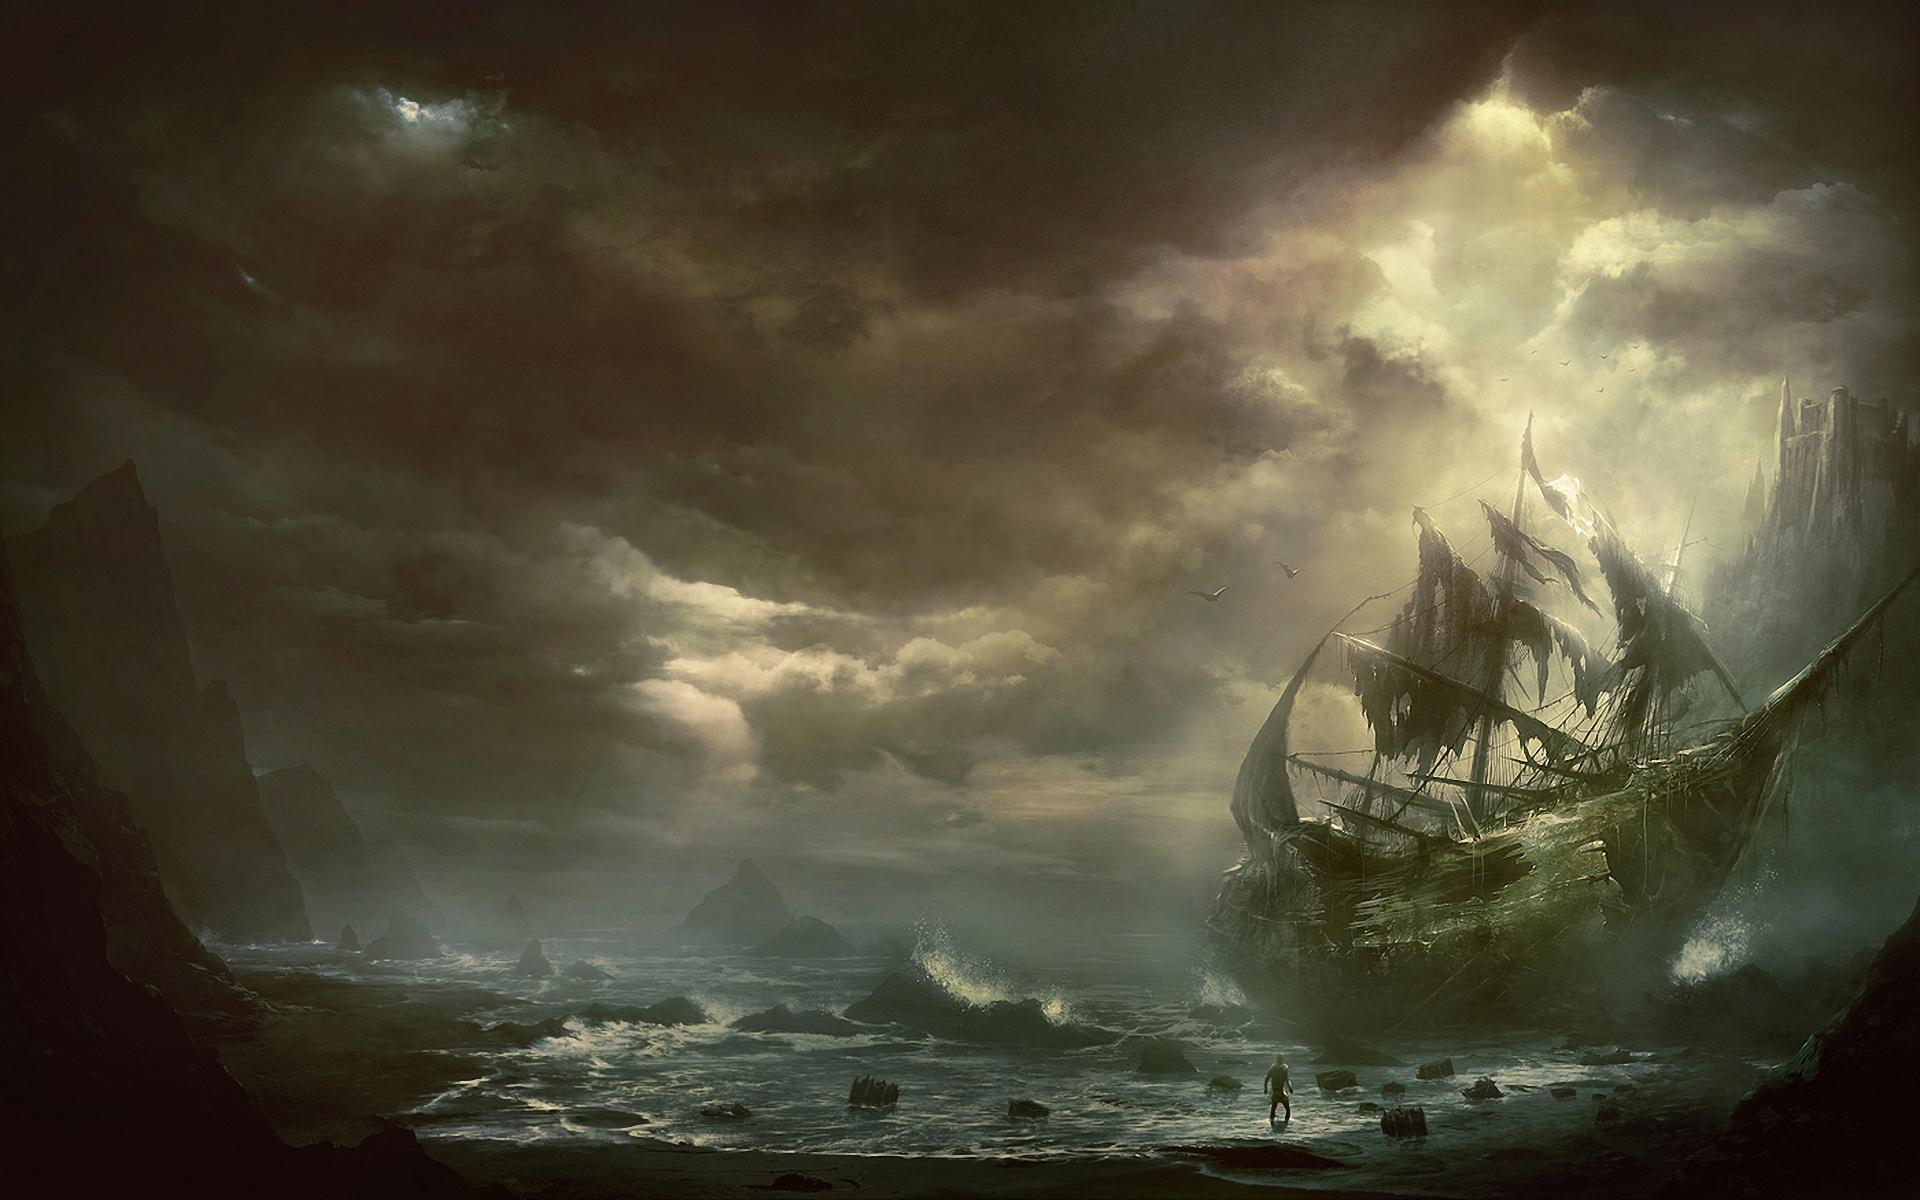 Ghost Pirate Ship Wallpaper Hd Resolution